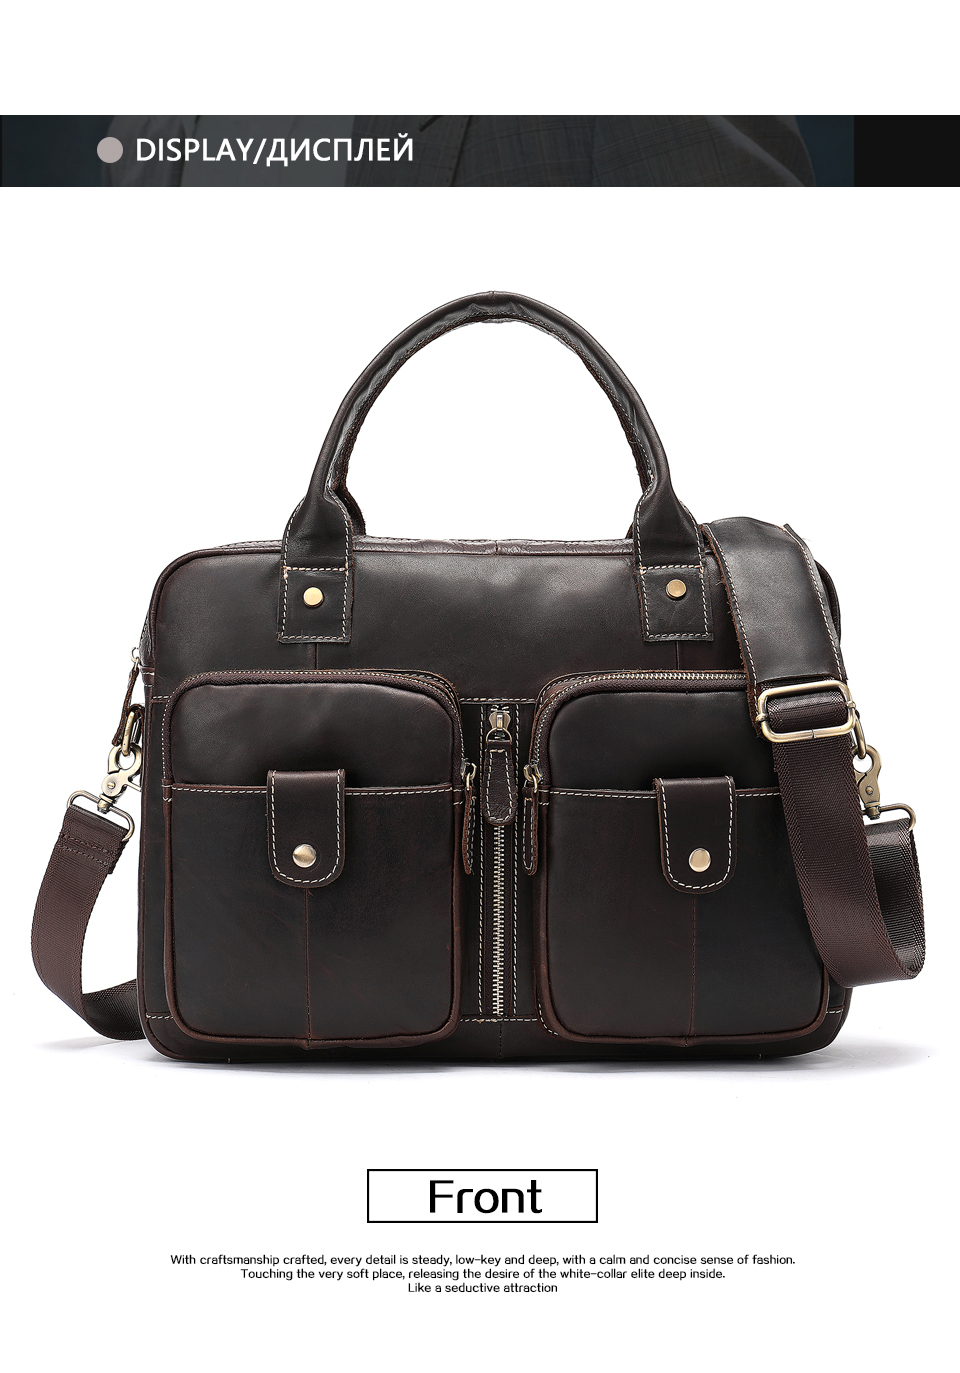 8 leather handbags